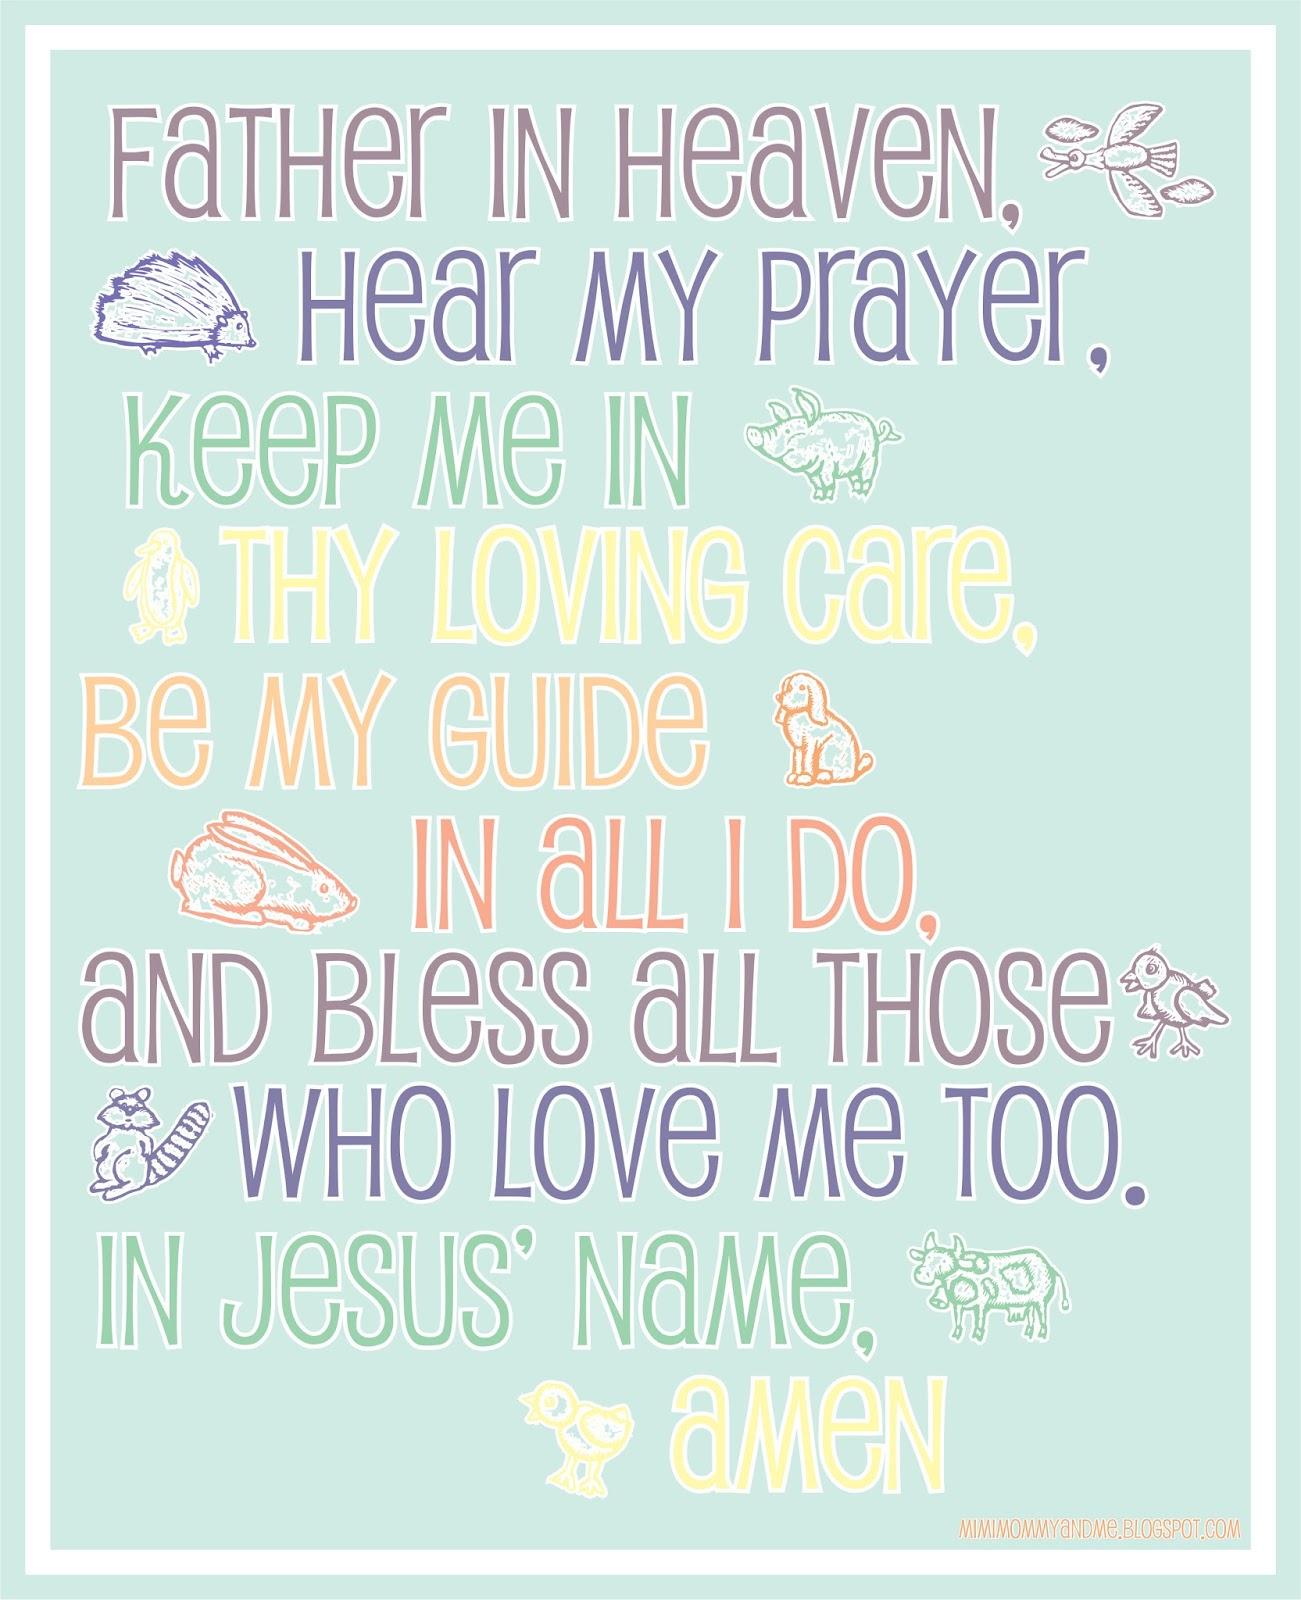 A Child's Prayer - Free Printable